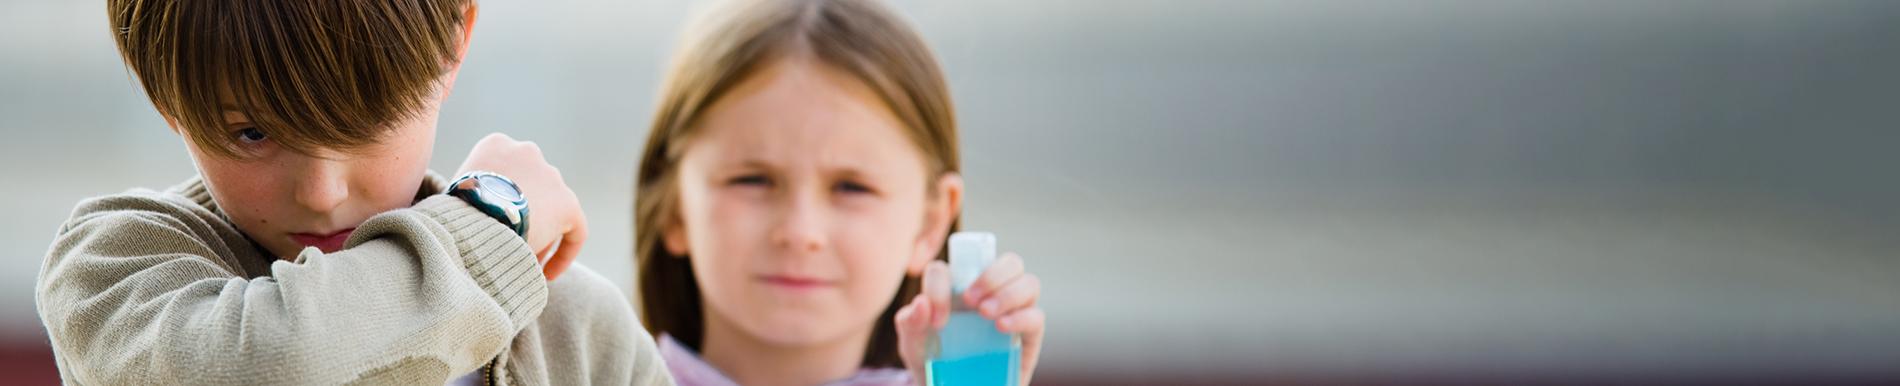 https://www.healthychildren.org/SiteCollectionImage-Homepage-Banners/CoronavirusBannerTwo.jpg?csf=1&e=H1RqUn